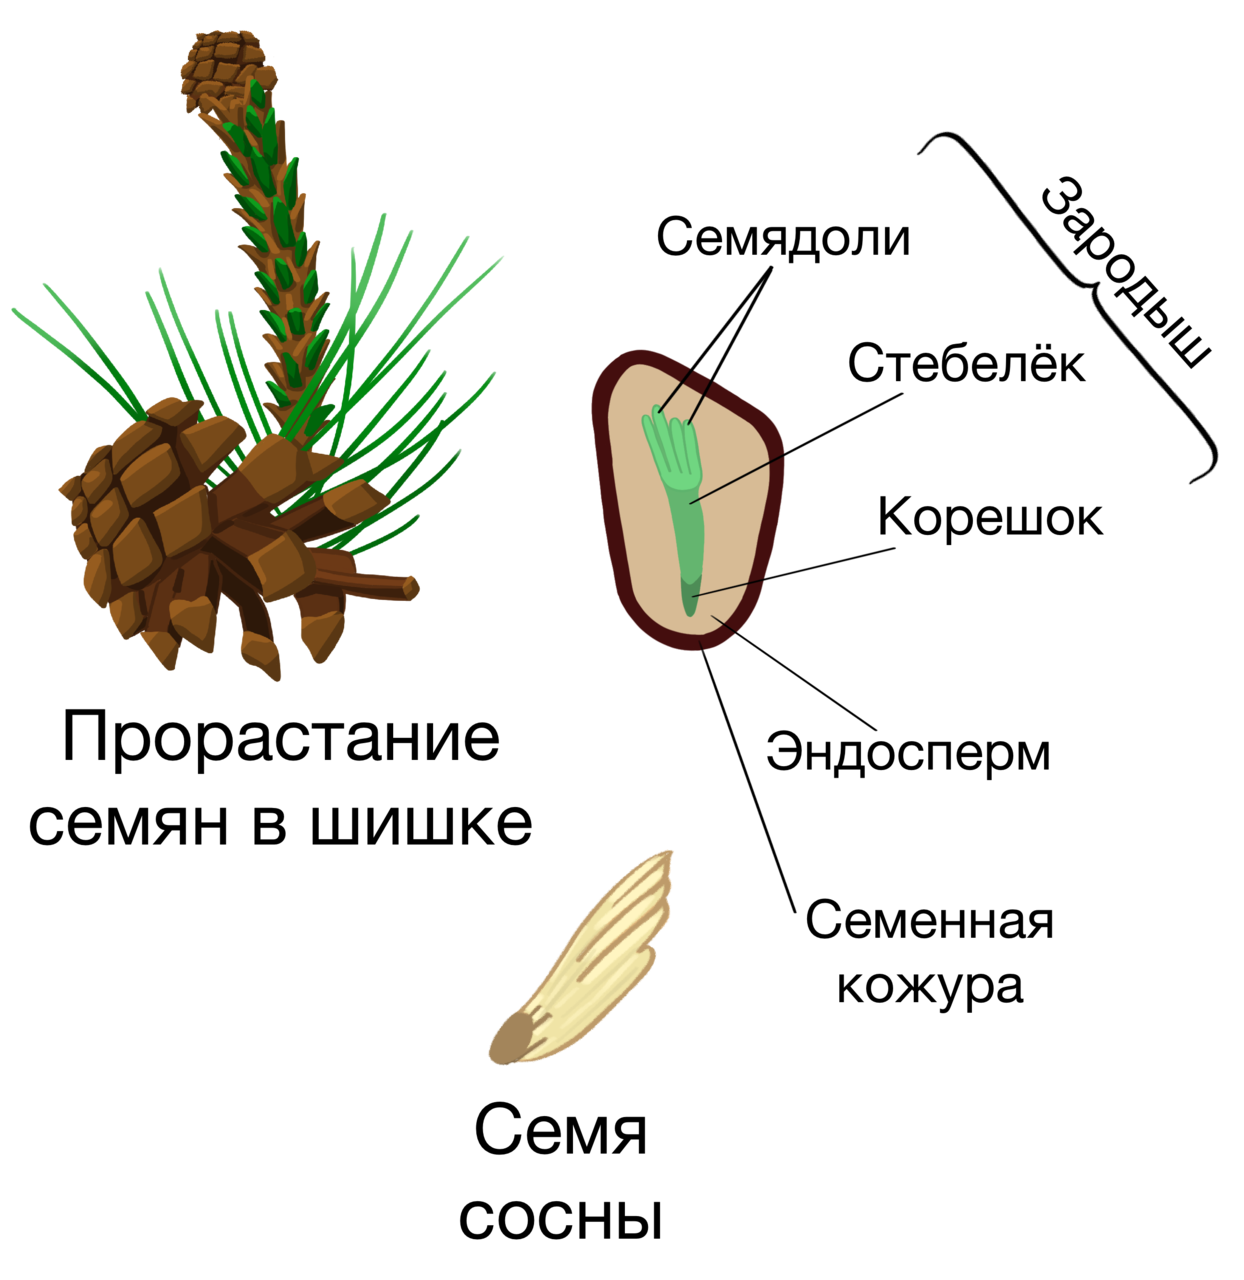 семя и спора у цветковых